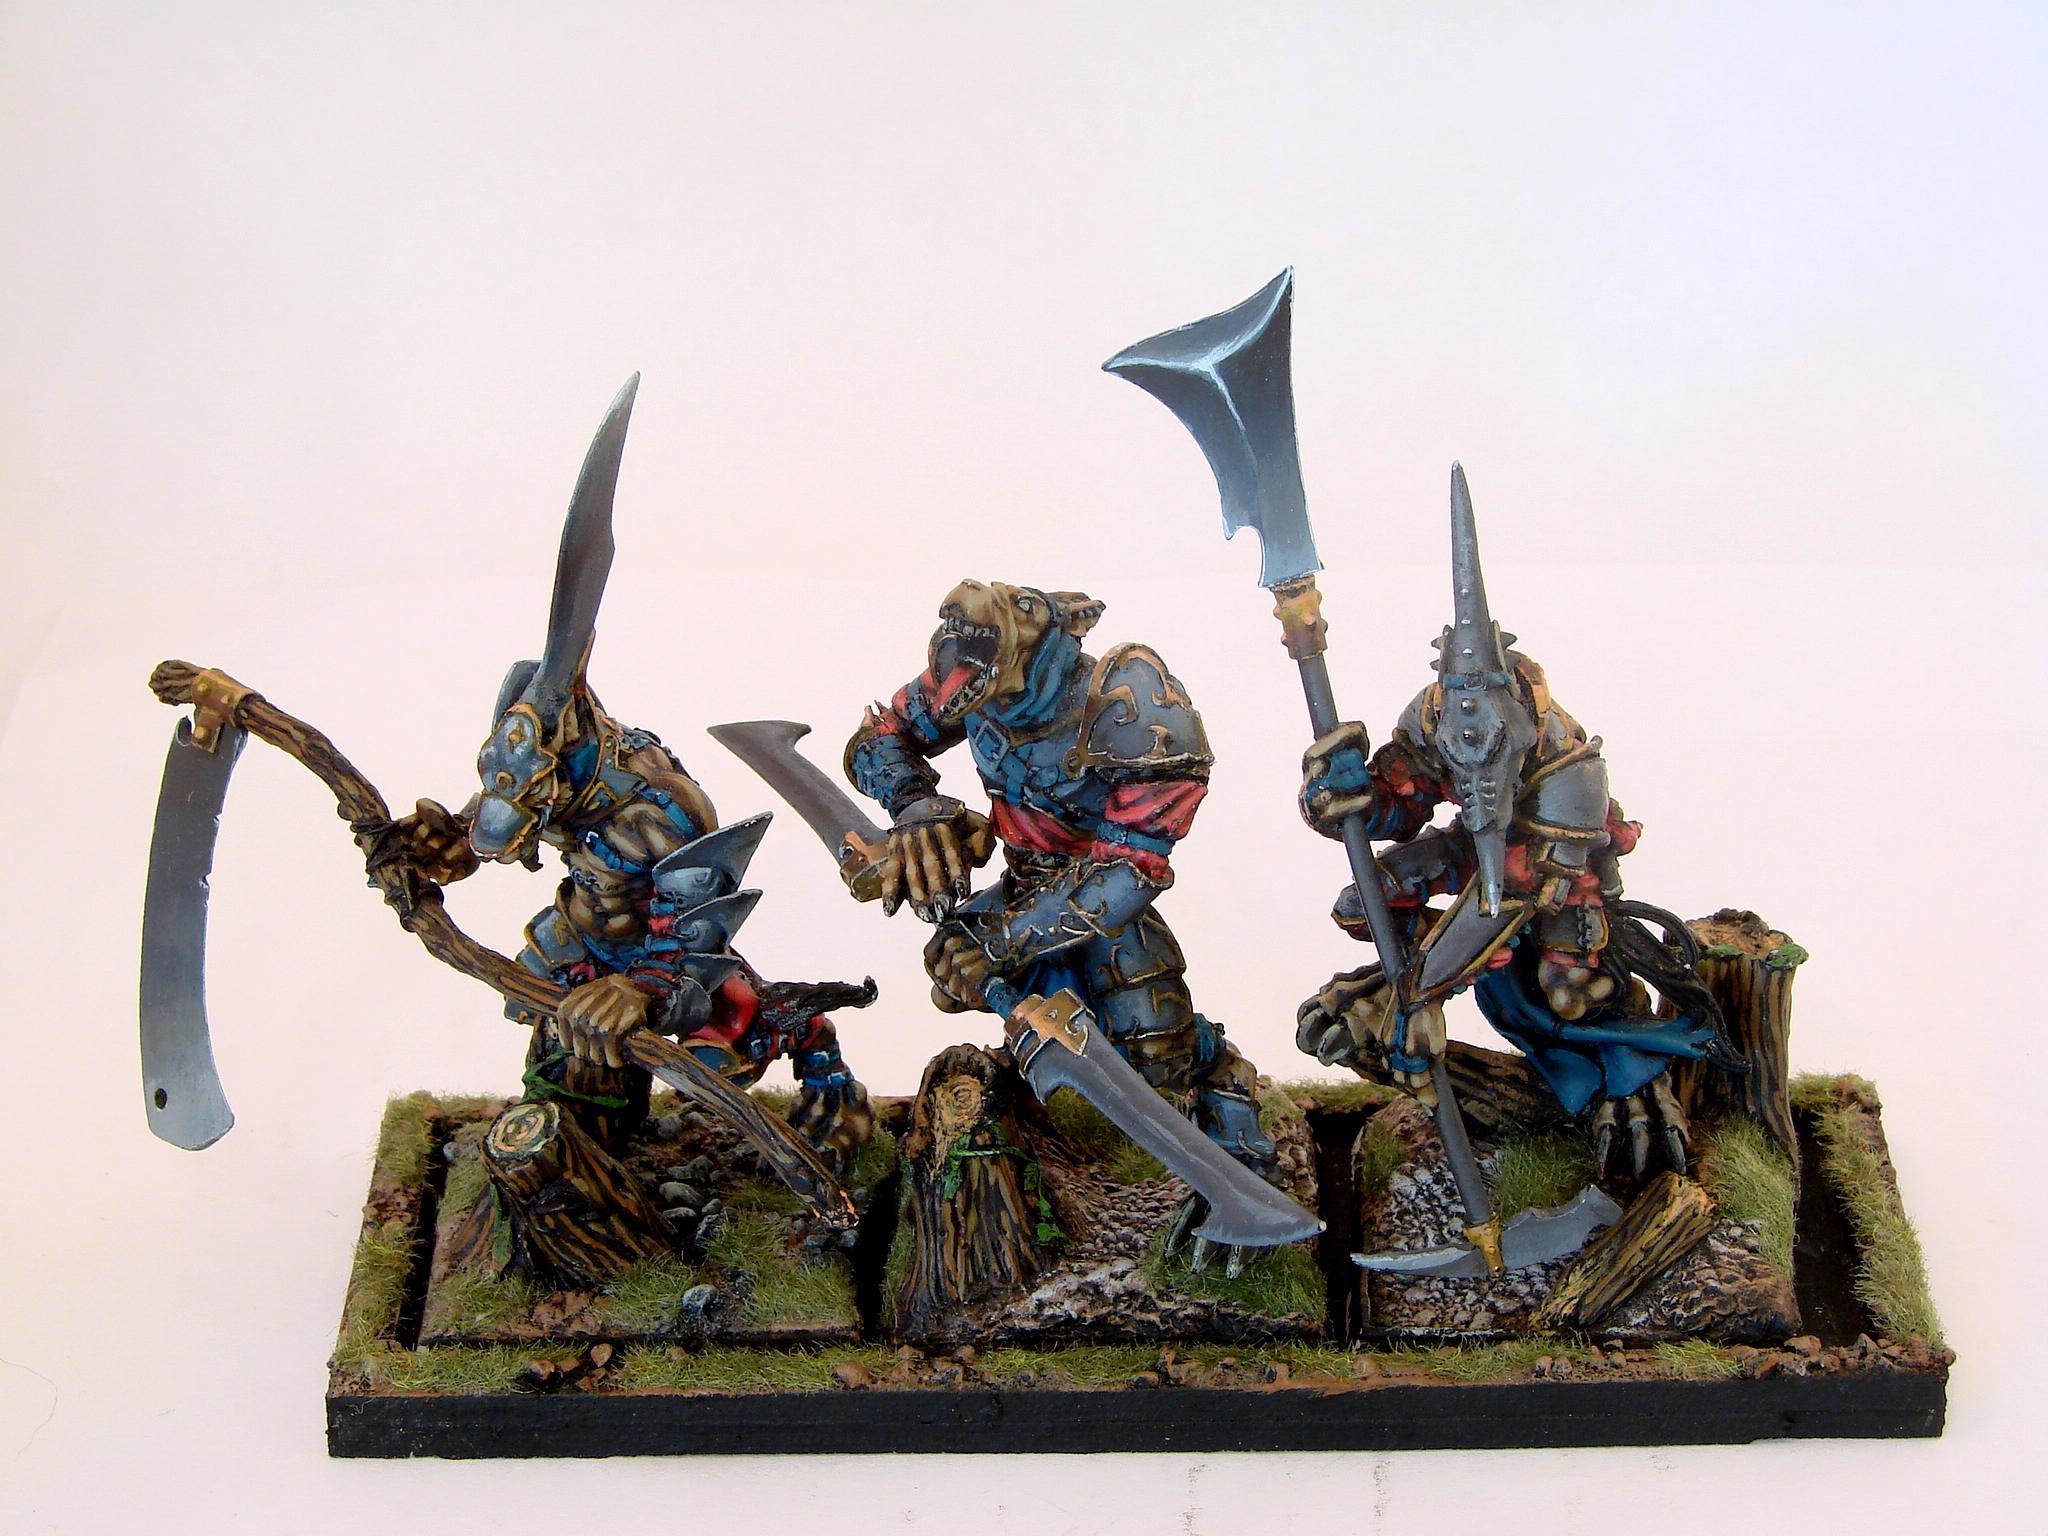 Ironguts, Non-Metallic Metal, Ogre Kingdoms, Rackham, Razormage